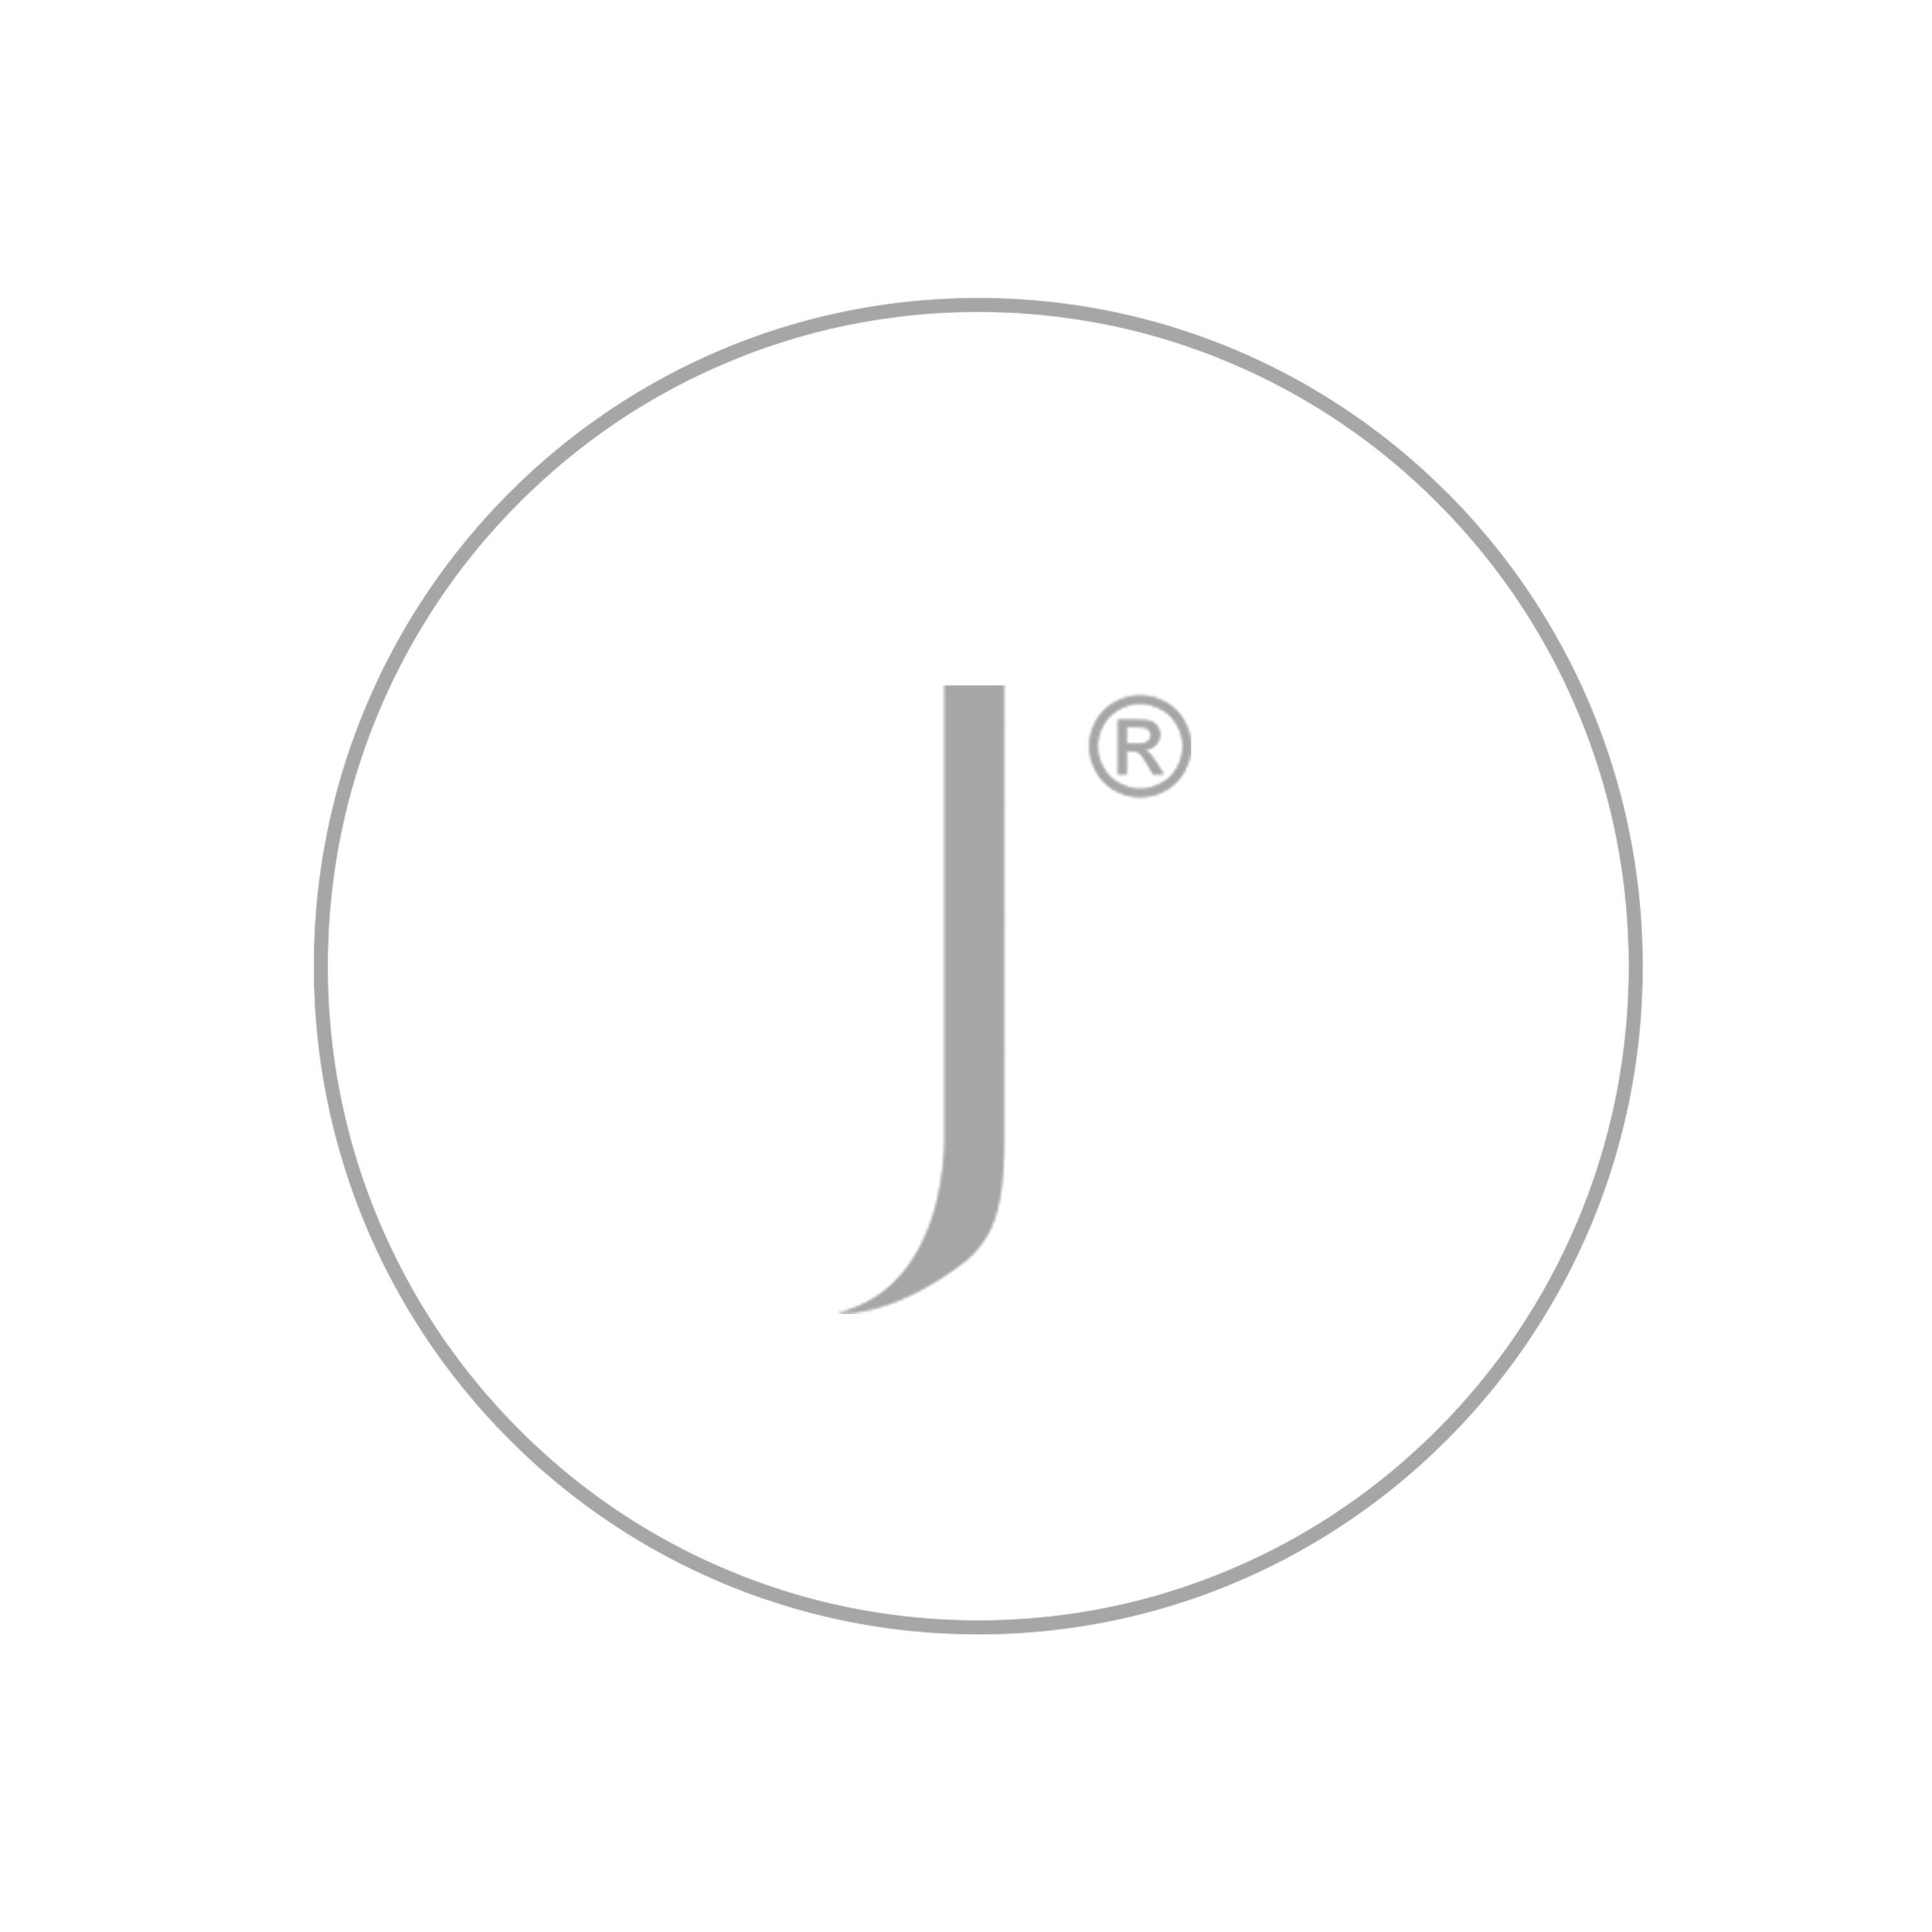 Gold Arabesque Bar Bracelet | Ileava Jewelry